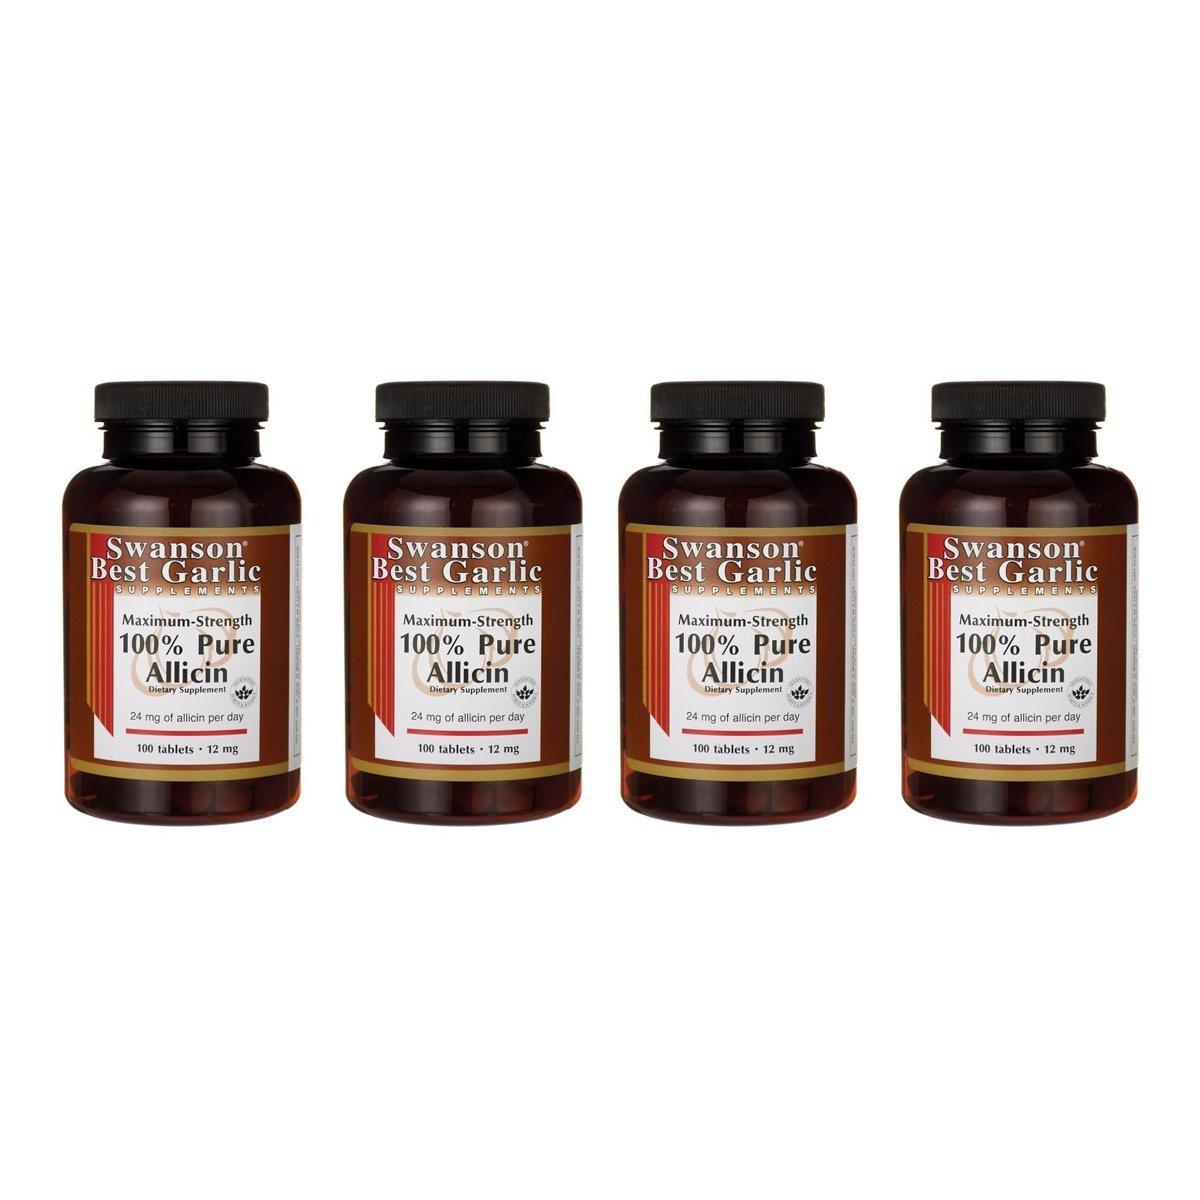 Swanson Maximum-Strength 100% Pure Allicin 12 mg 100 Tabs 4 Pack